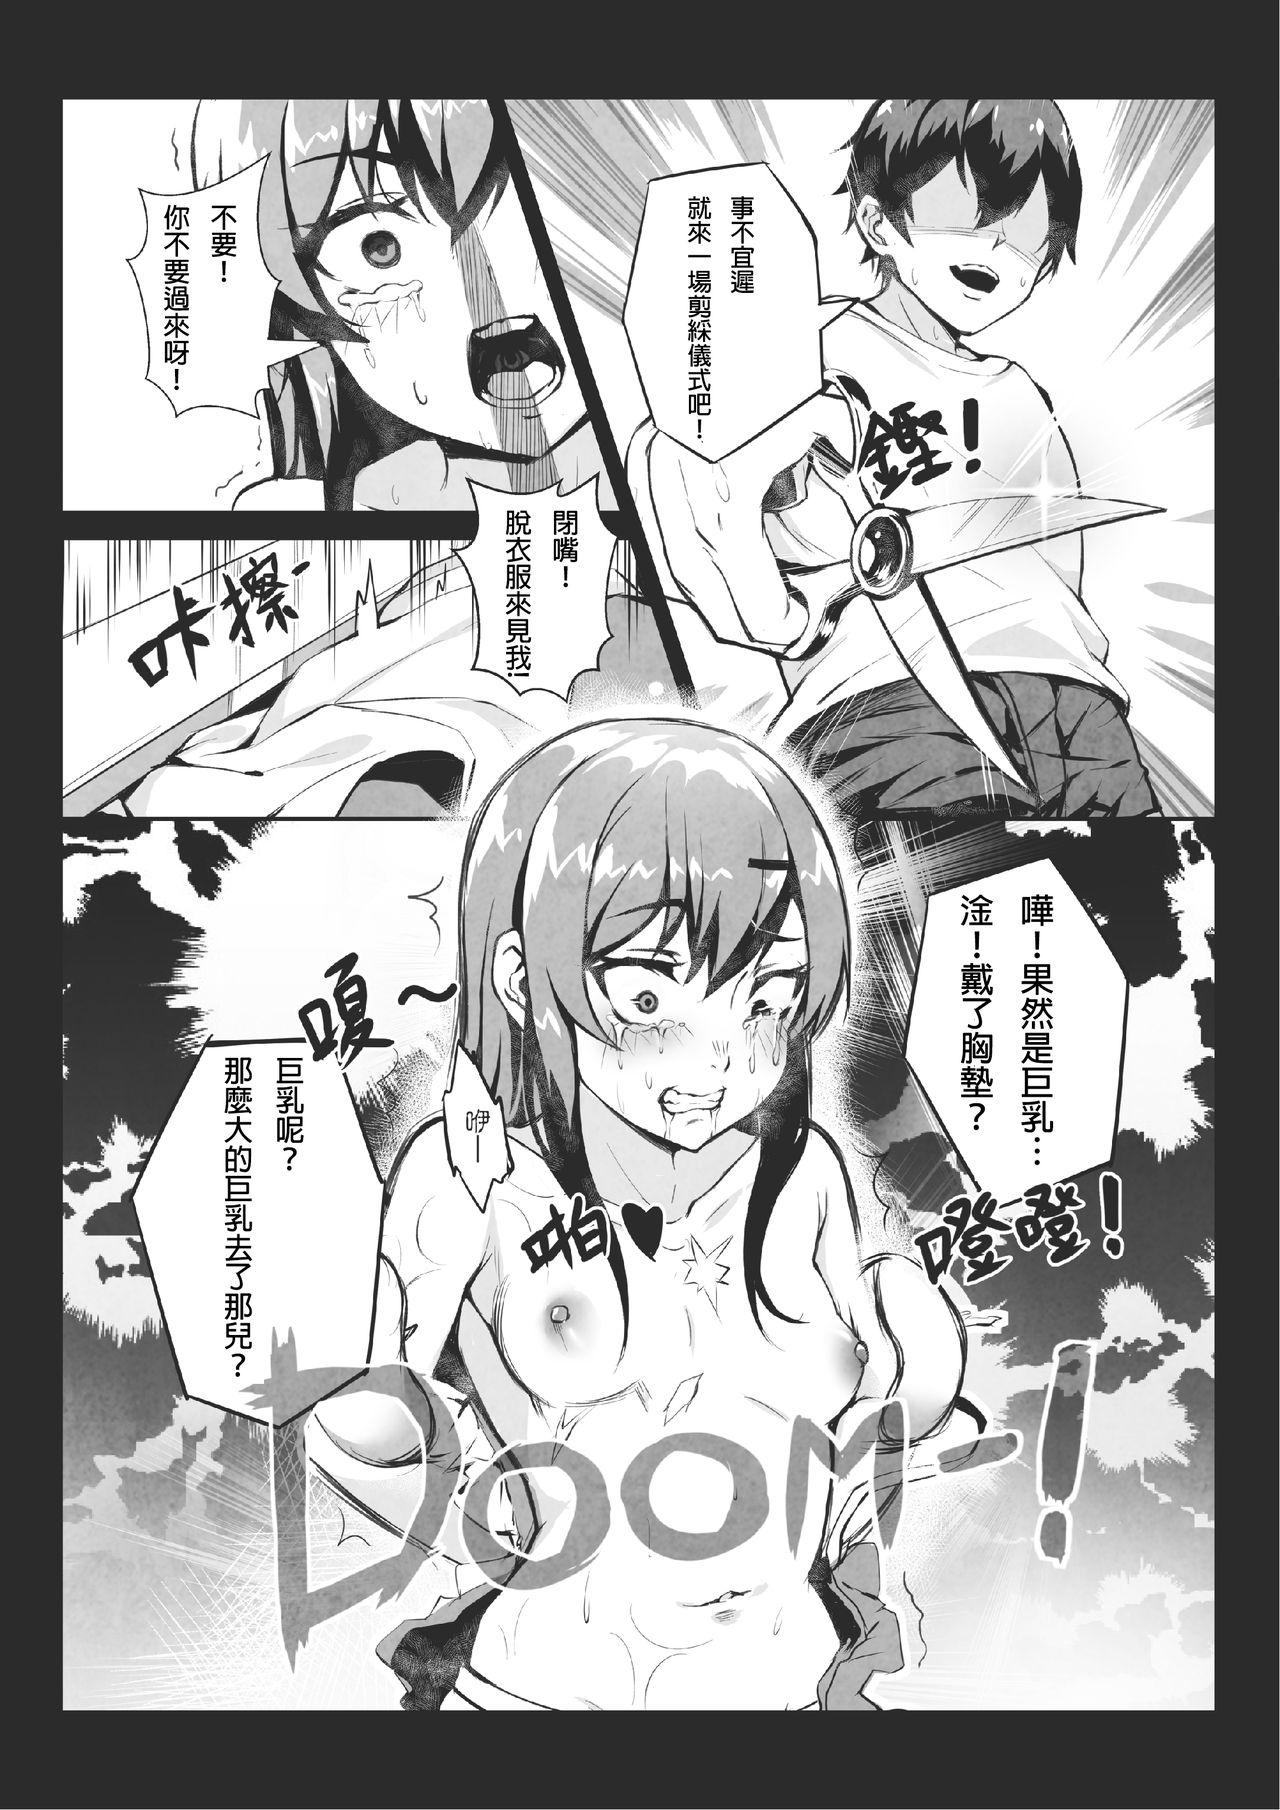 [Gantou Ikunoro] MK girl embodies the spirit of Hong Kong under the Lion Rock [Chinese]  [君廣東話本當上手機翻漢化組] v2 10